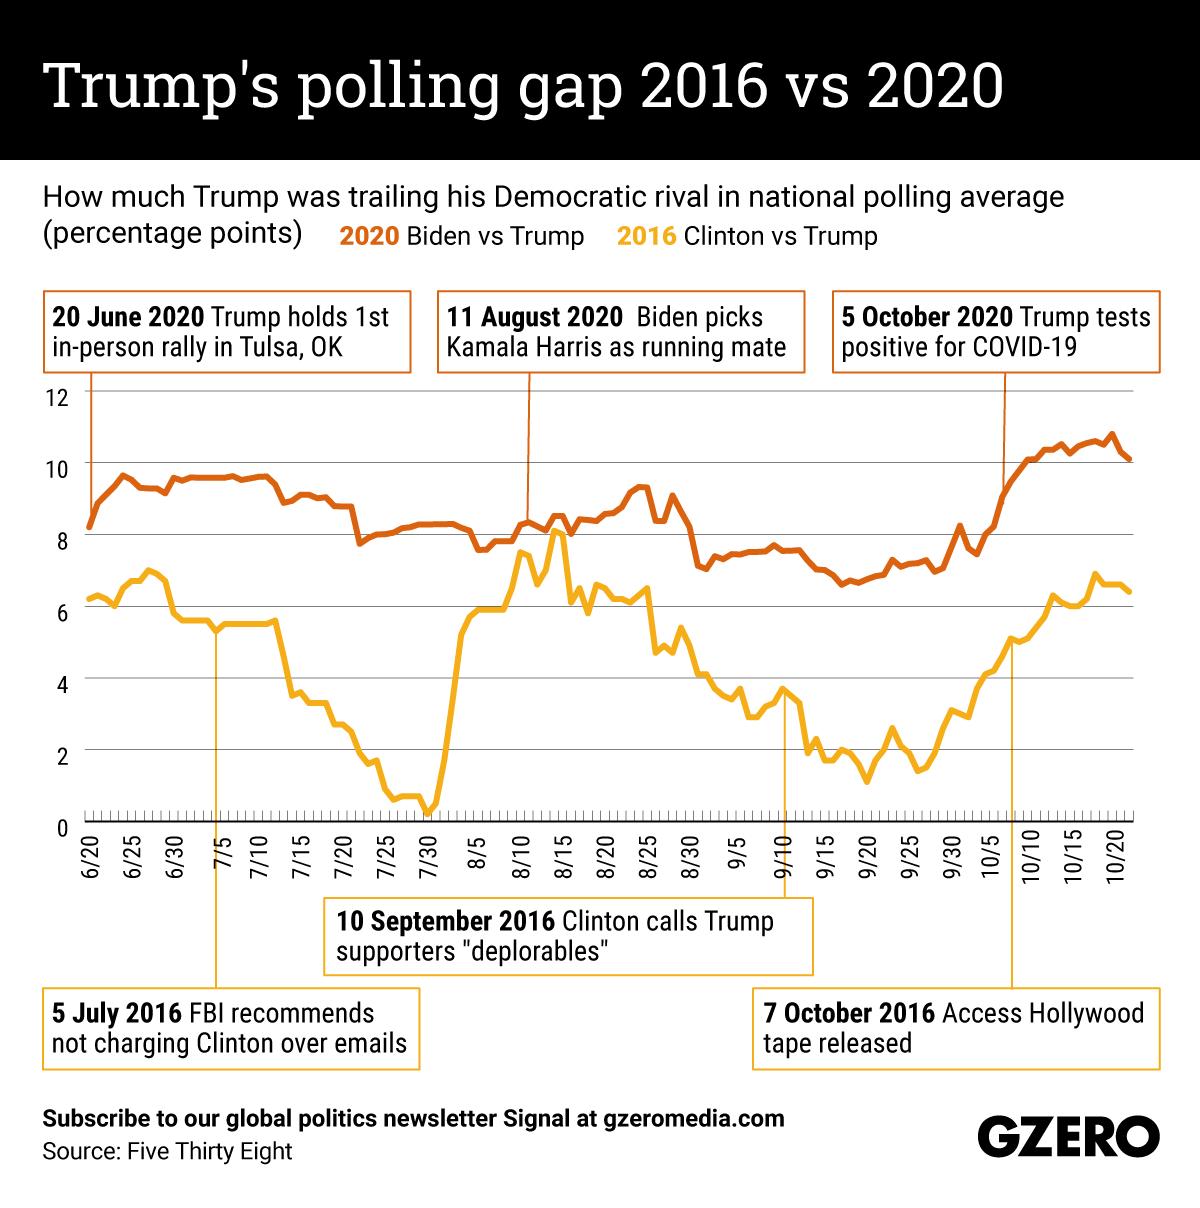 The Graphic Truth: Trump's polling gap 2016 vs 2020